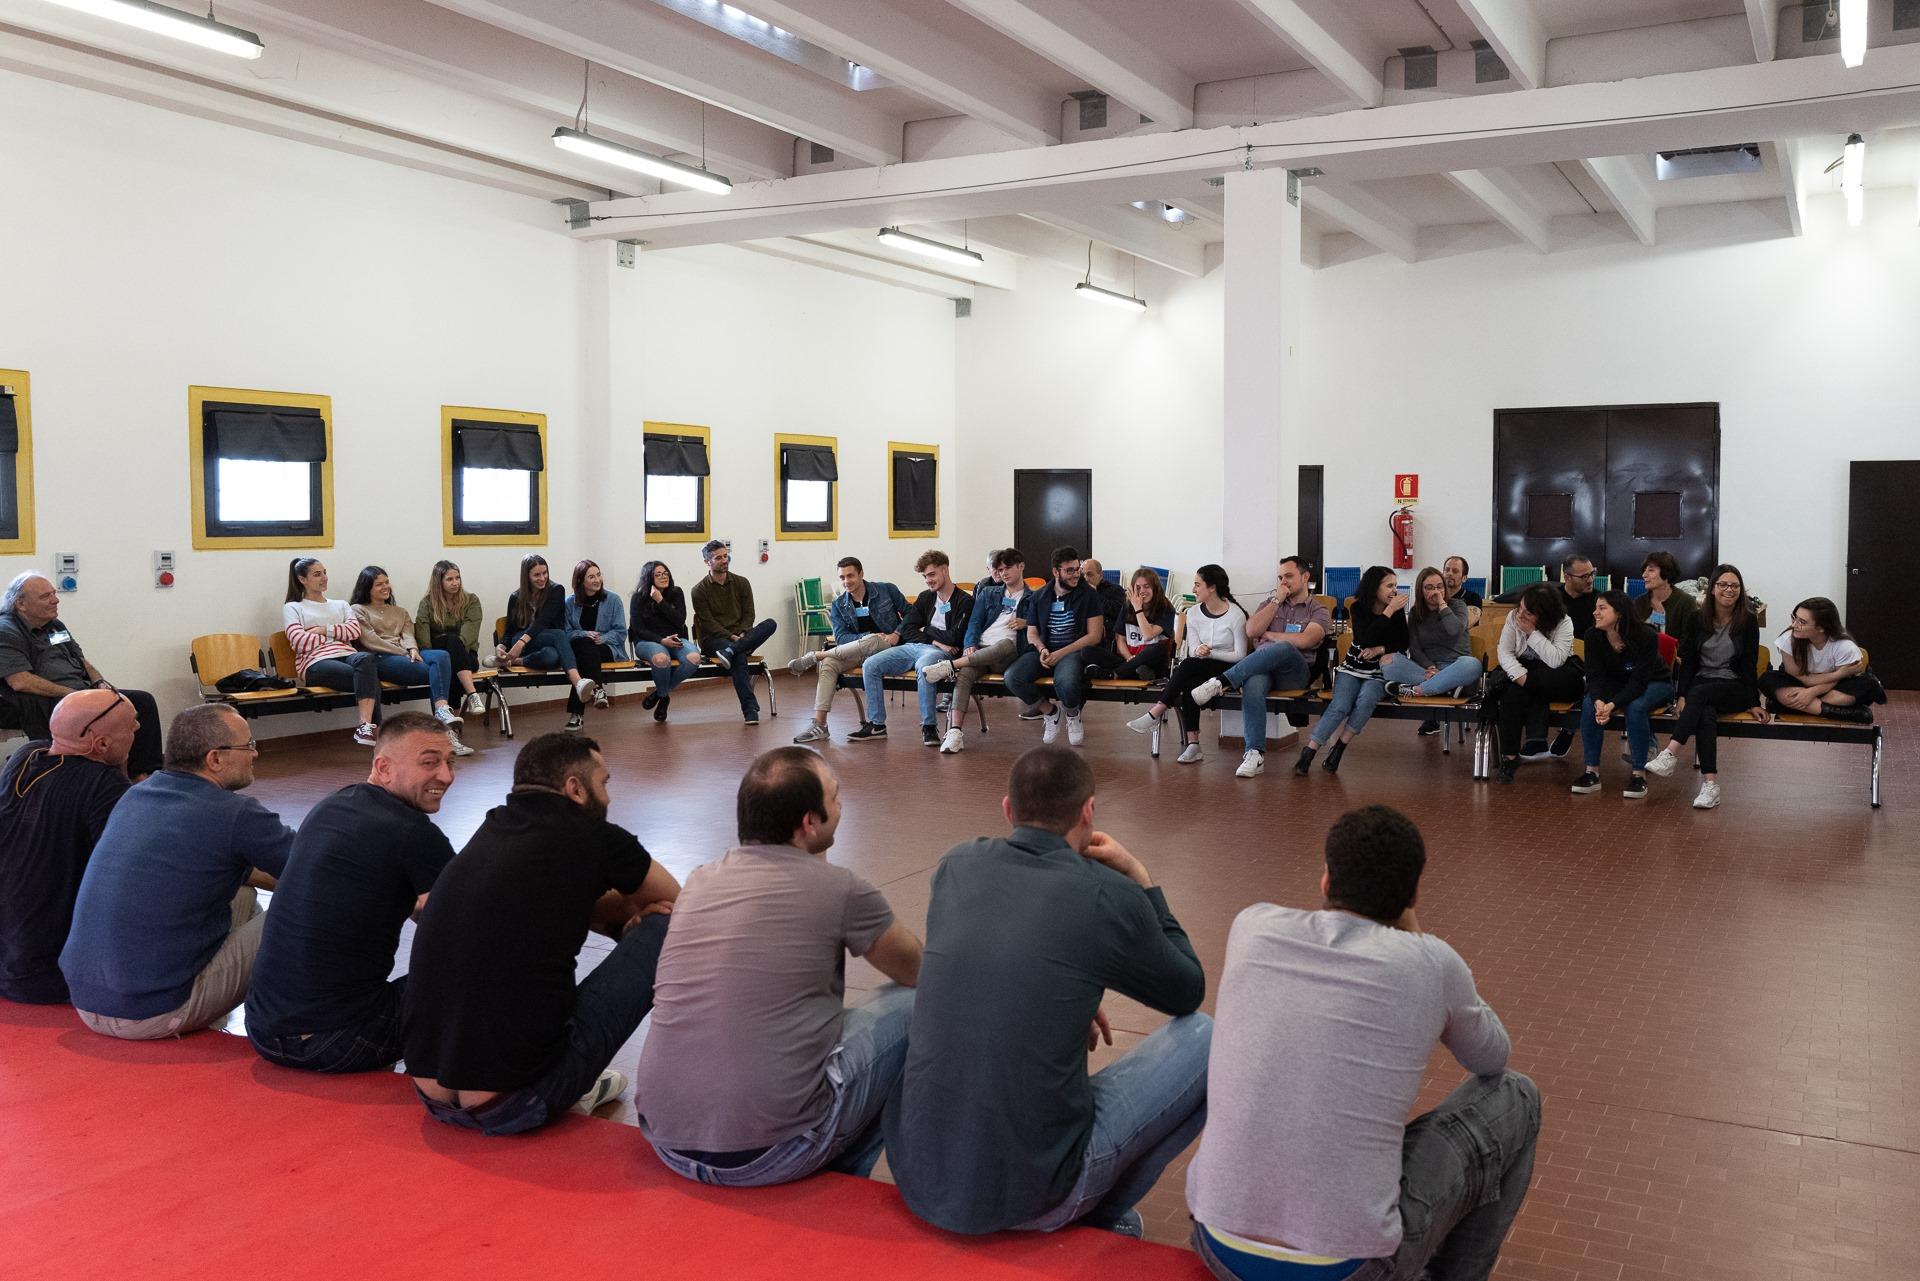 Teatro-Nucleo-Prove-Liceo-ph-Daniele-Mantovani(2)